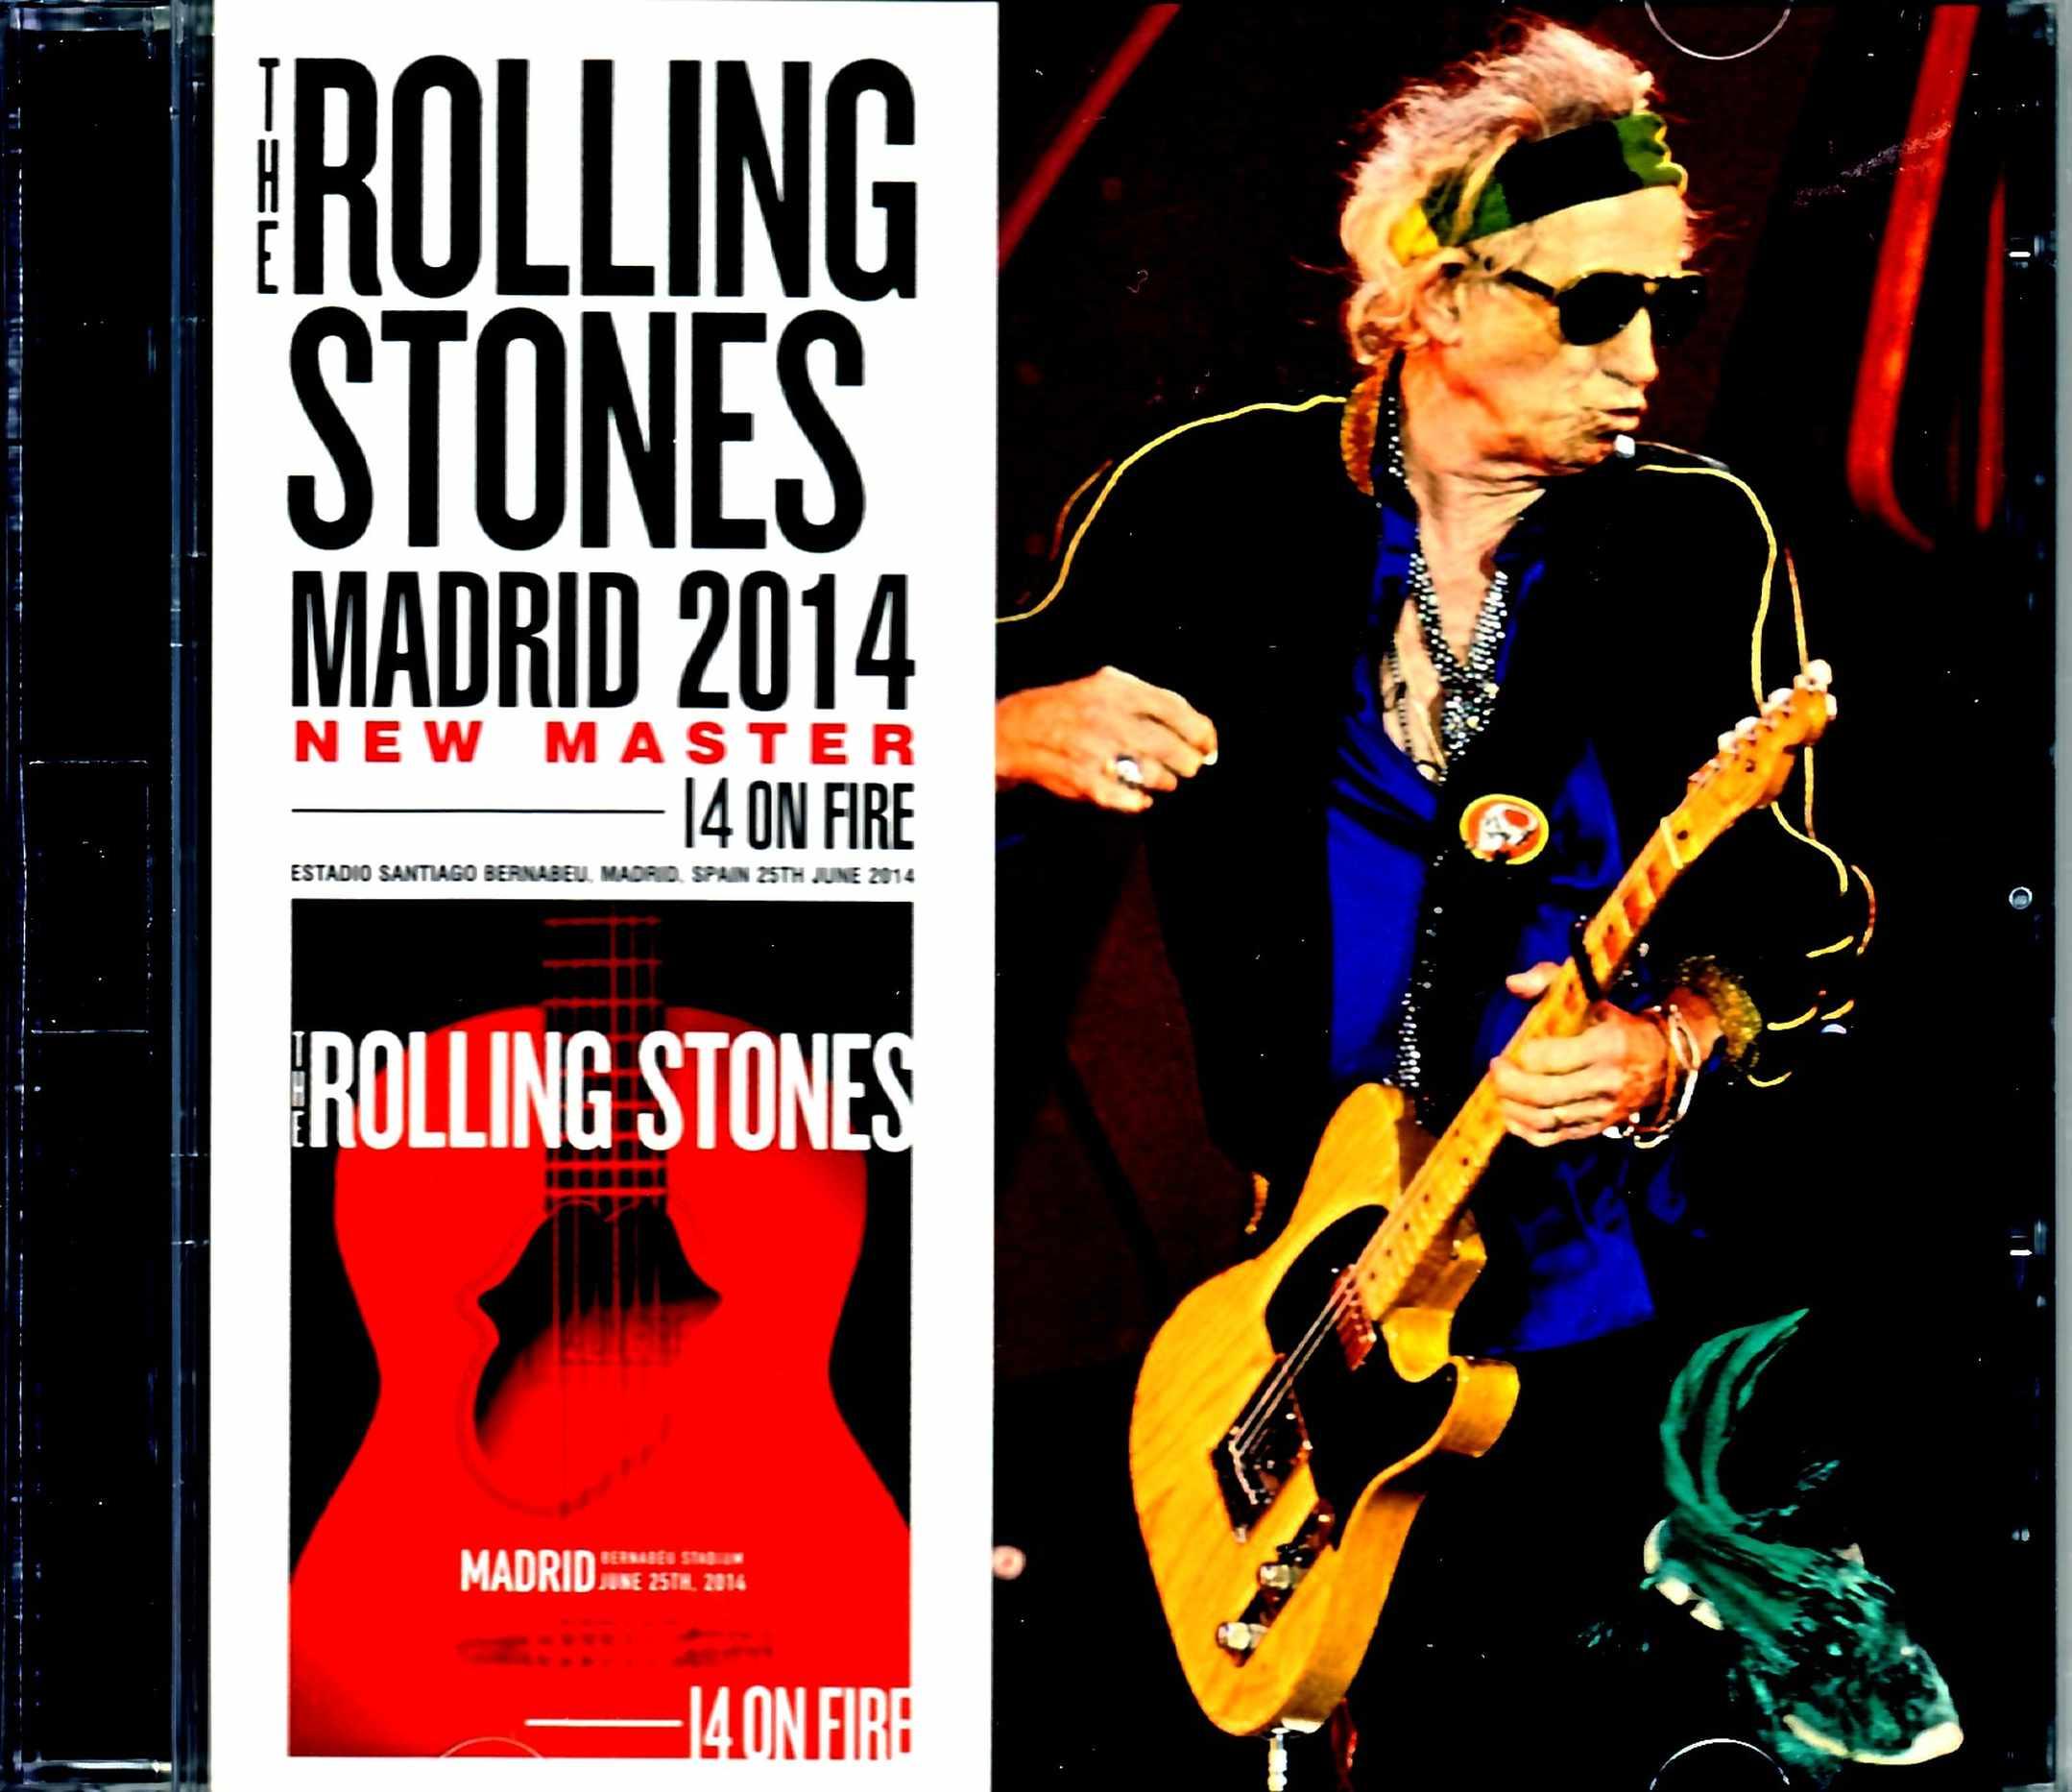 Rolling Stones ローリング・ストーンズ/Spain 2014 New Master